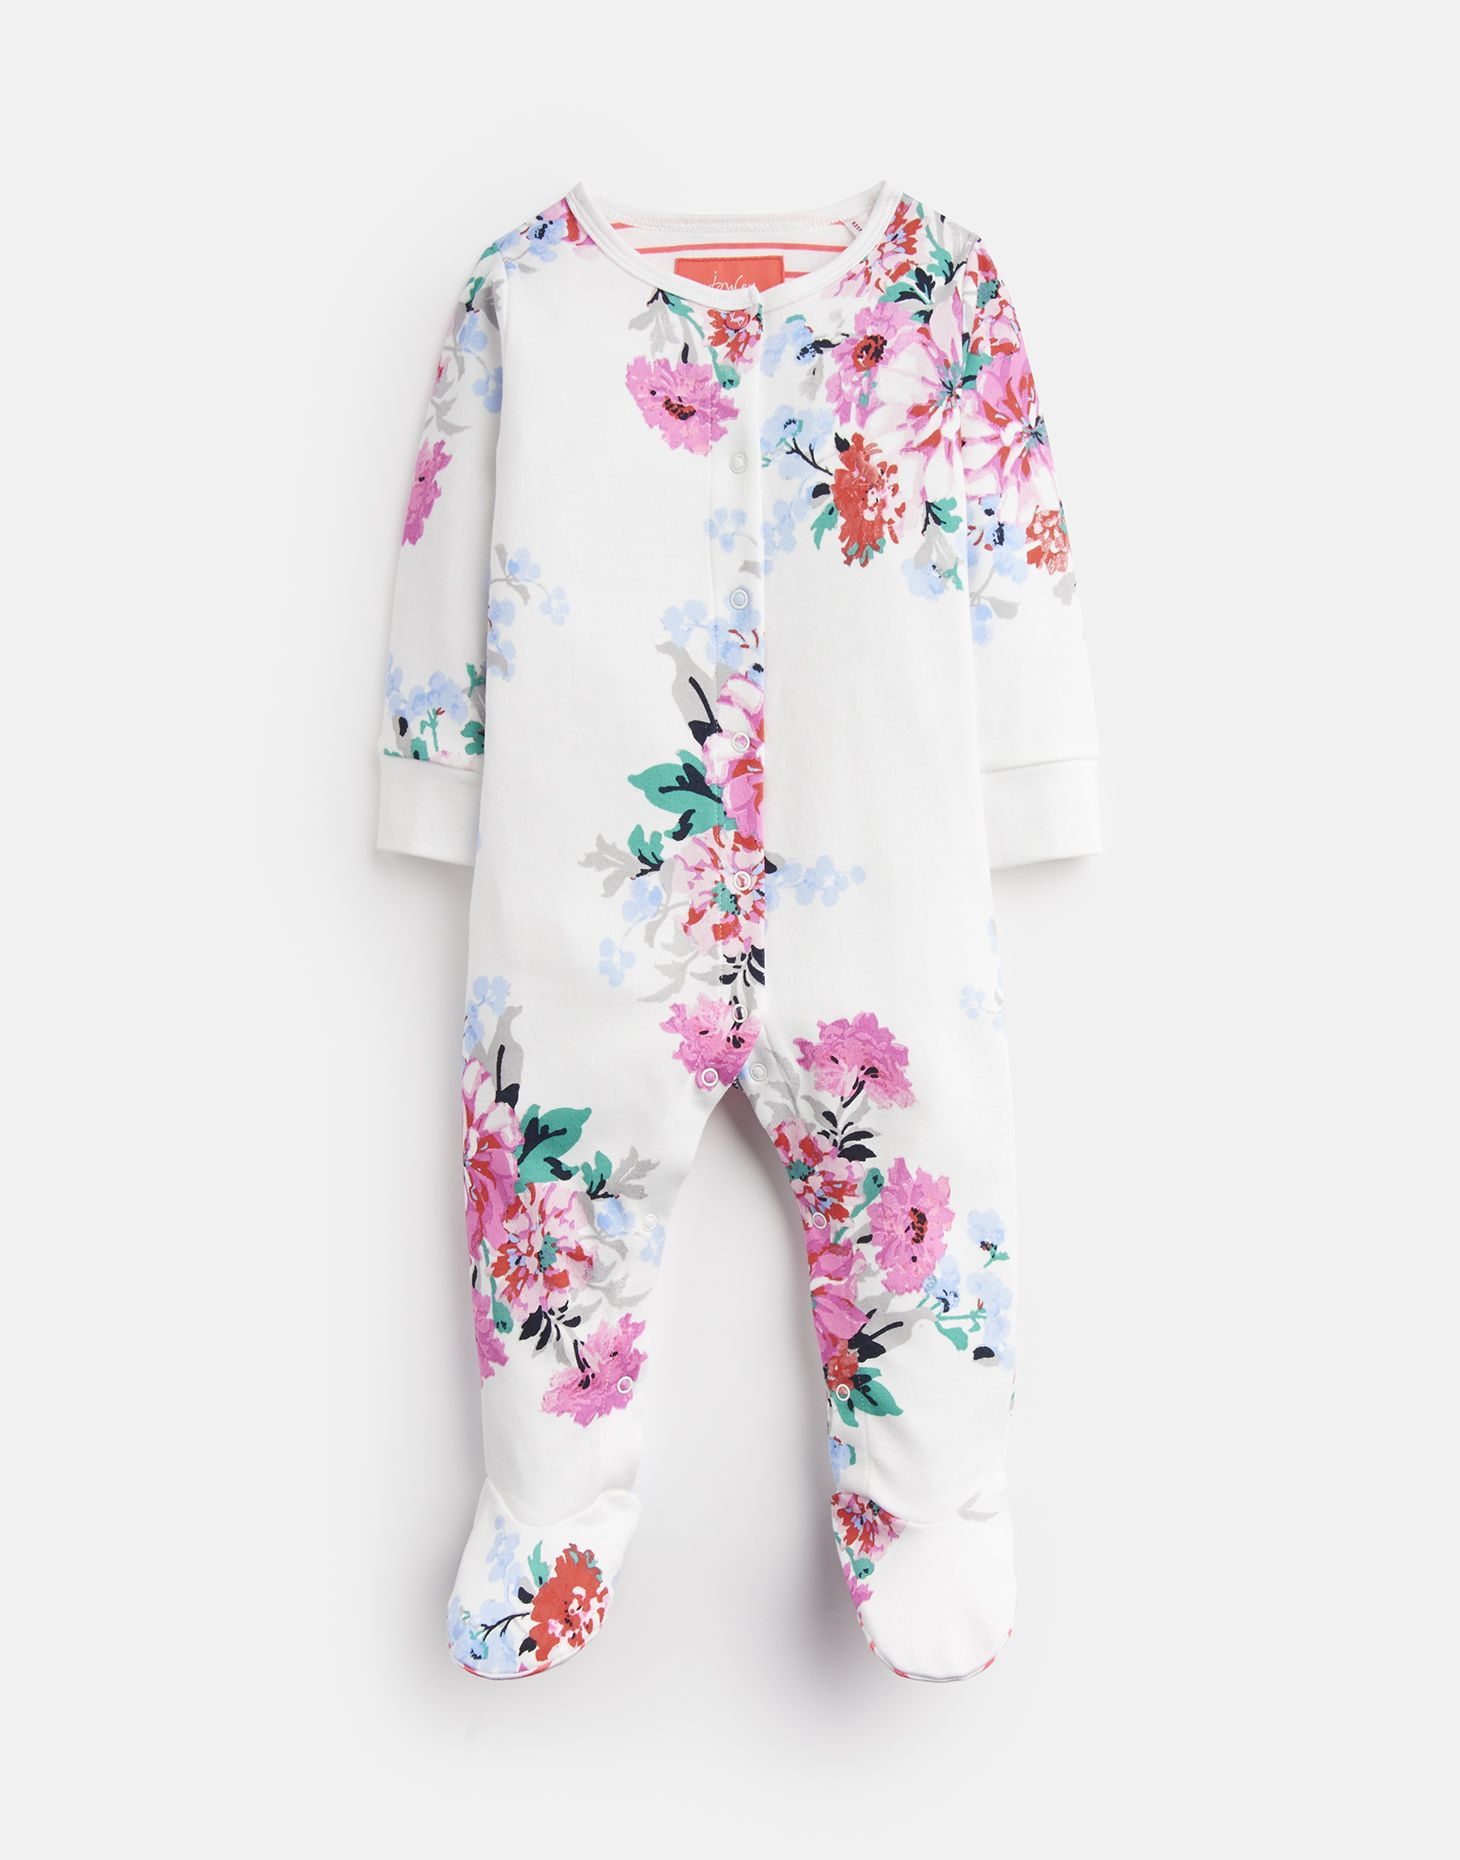 47daee805 Razamataz WHITE SMALL FLORAL JERSEY PRINTED BABYGROW